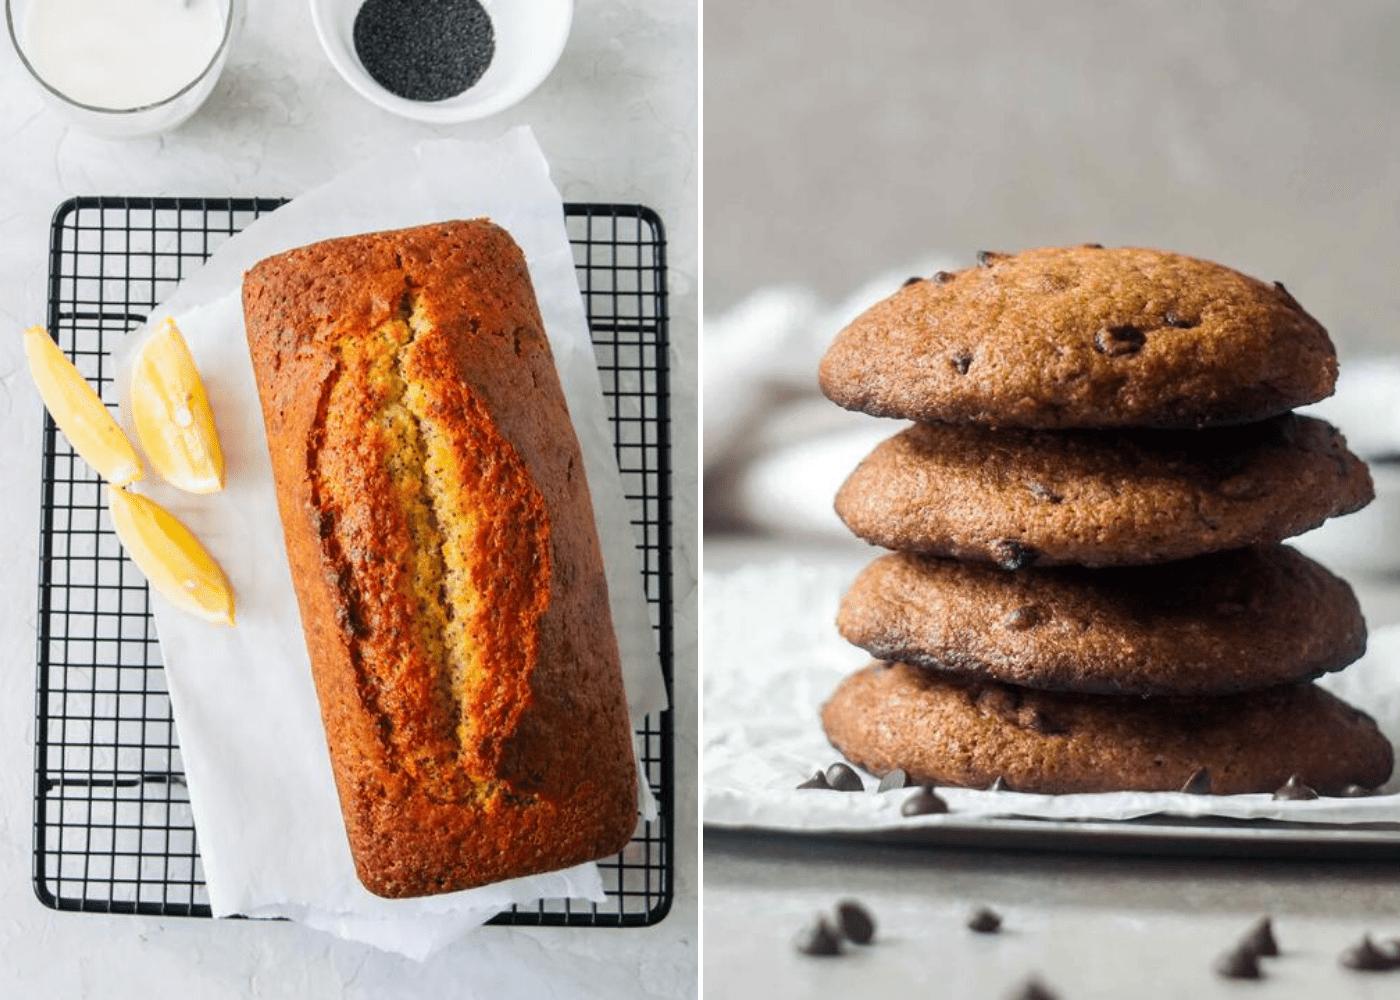 Baking kits: Bakeri